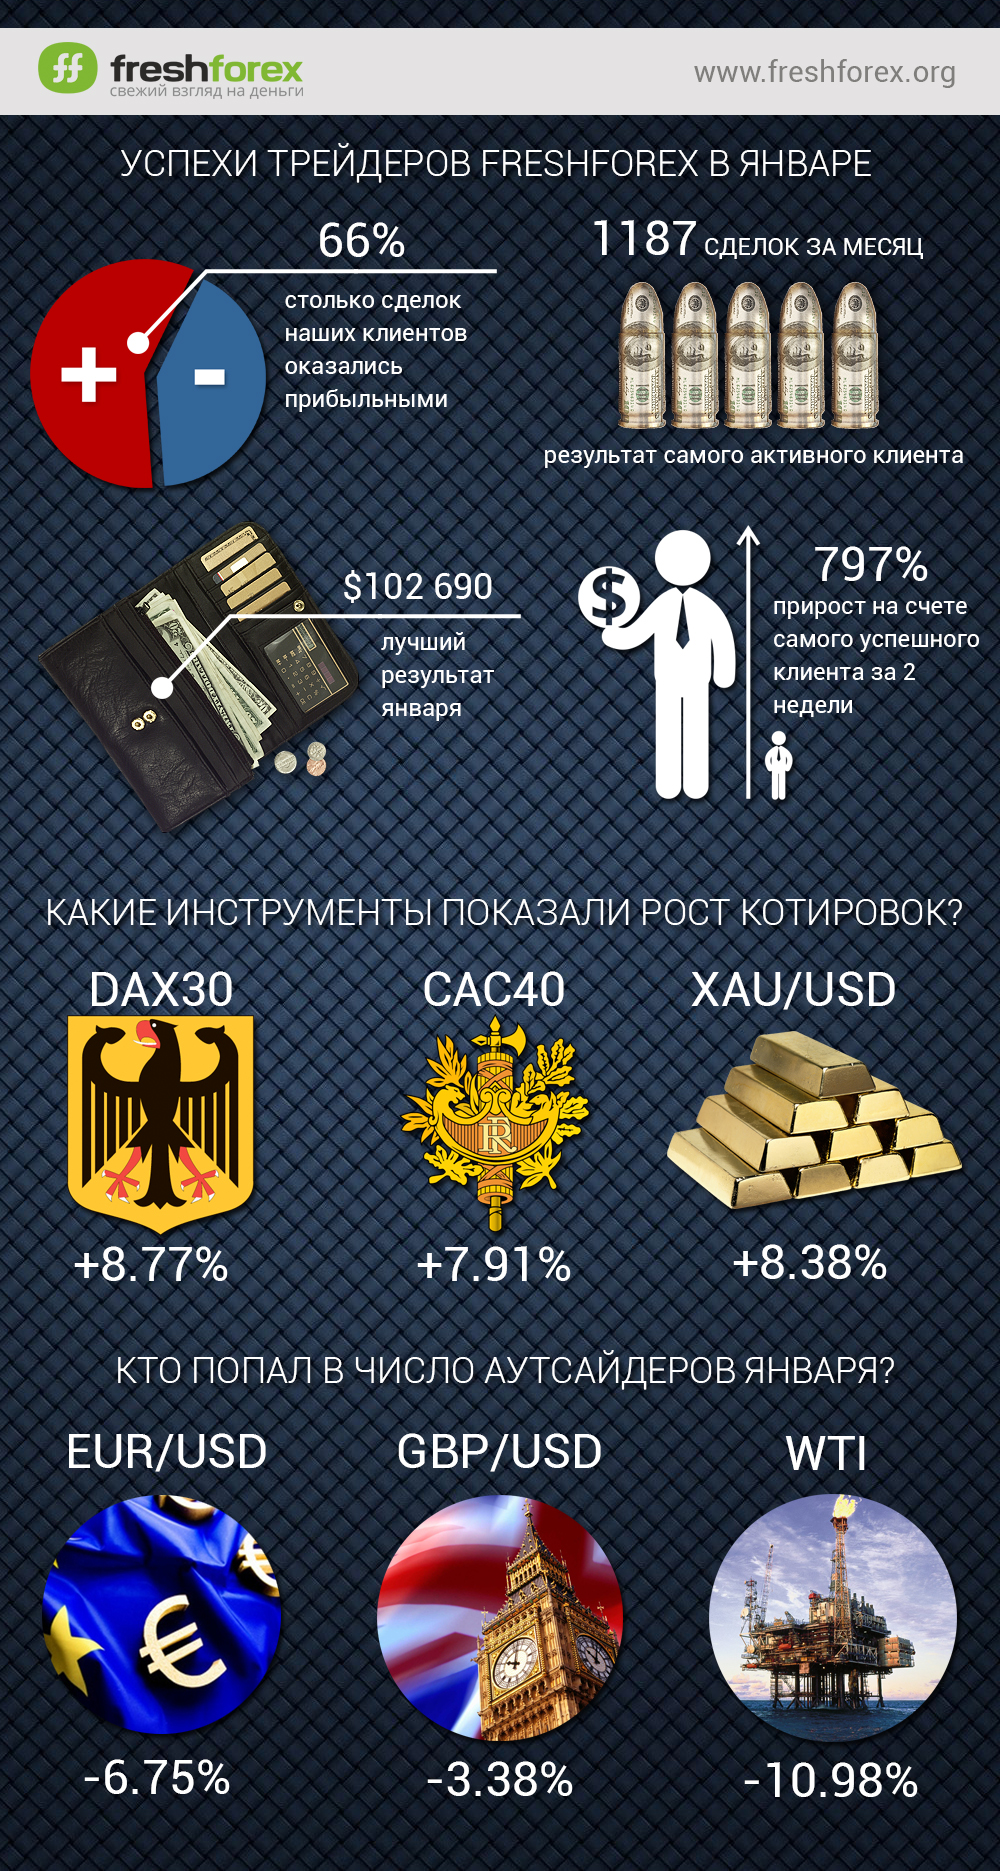 https://freshforex.org/netcat_files/Image/infografika%20yanvar'.jpg